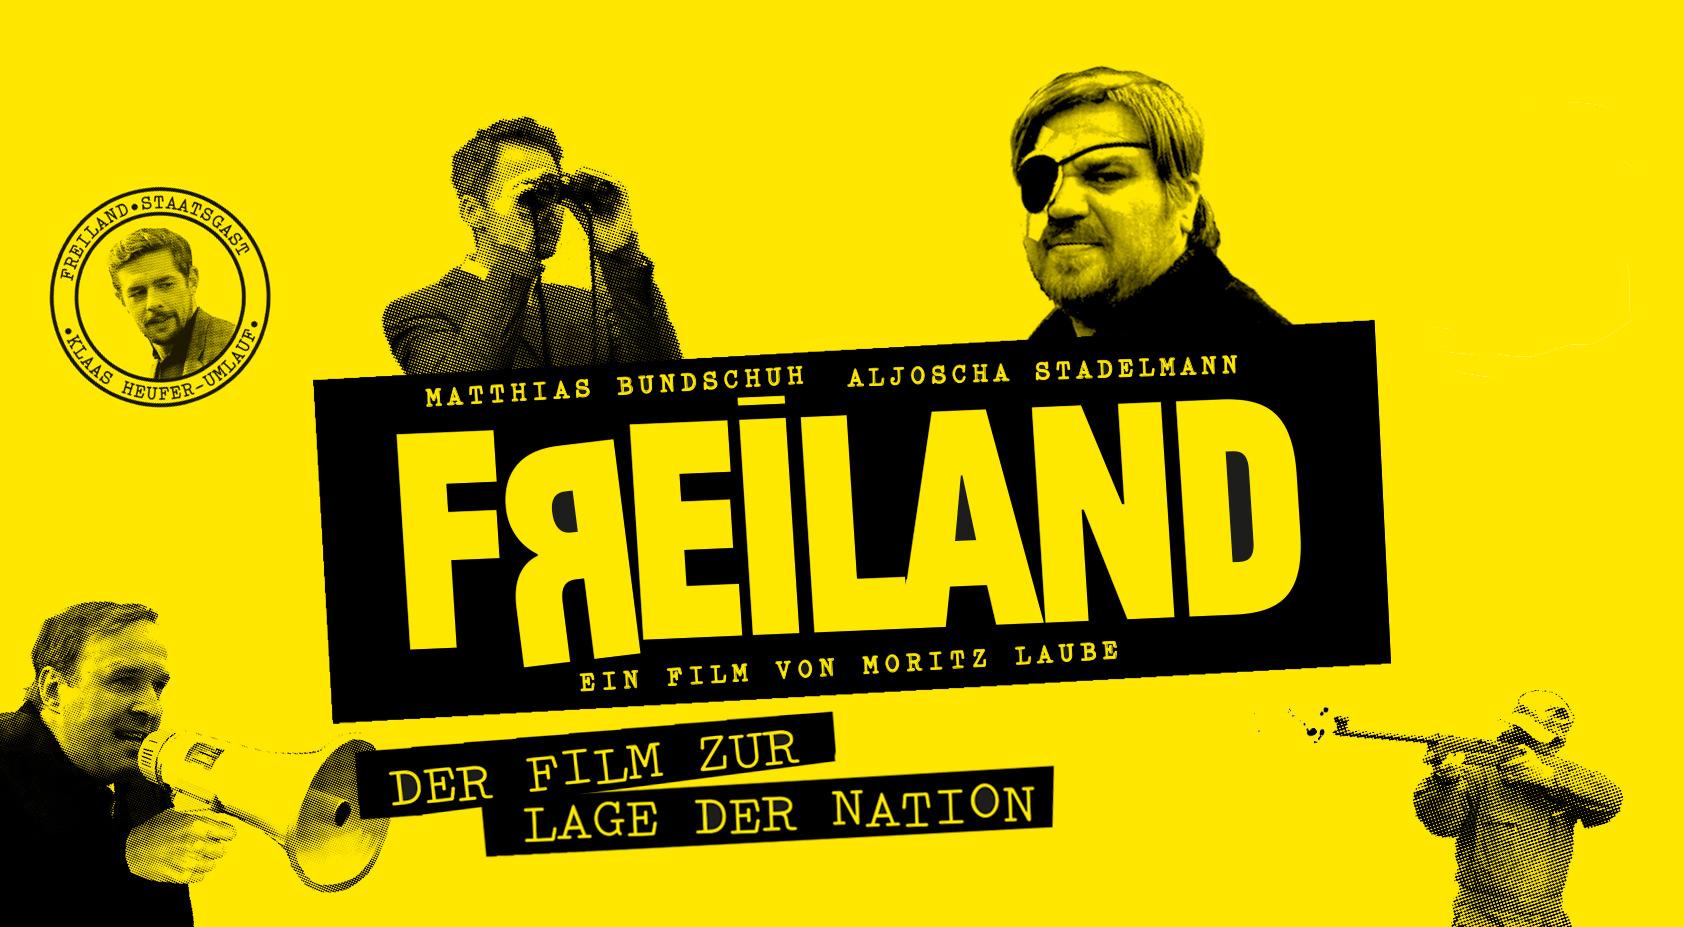 Freiland Film